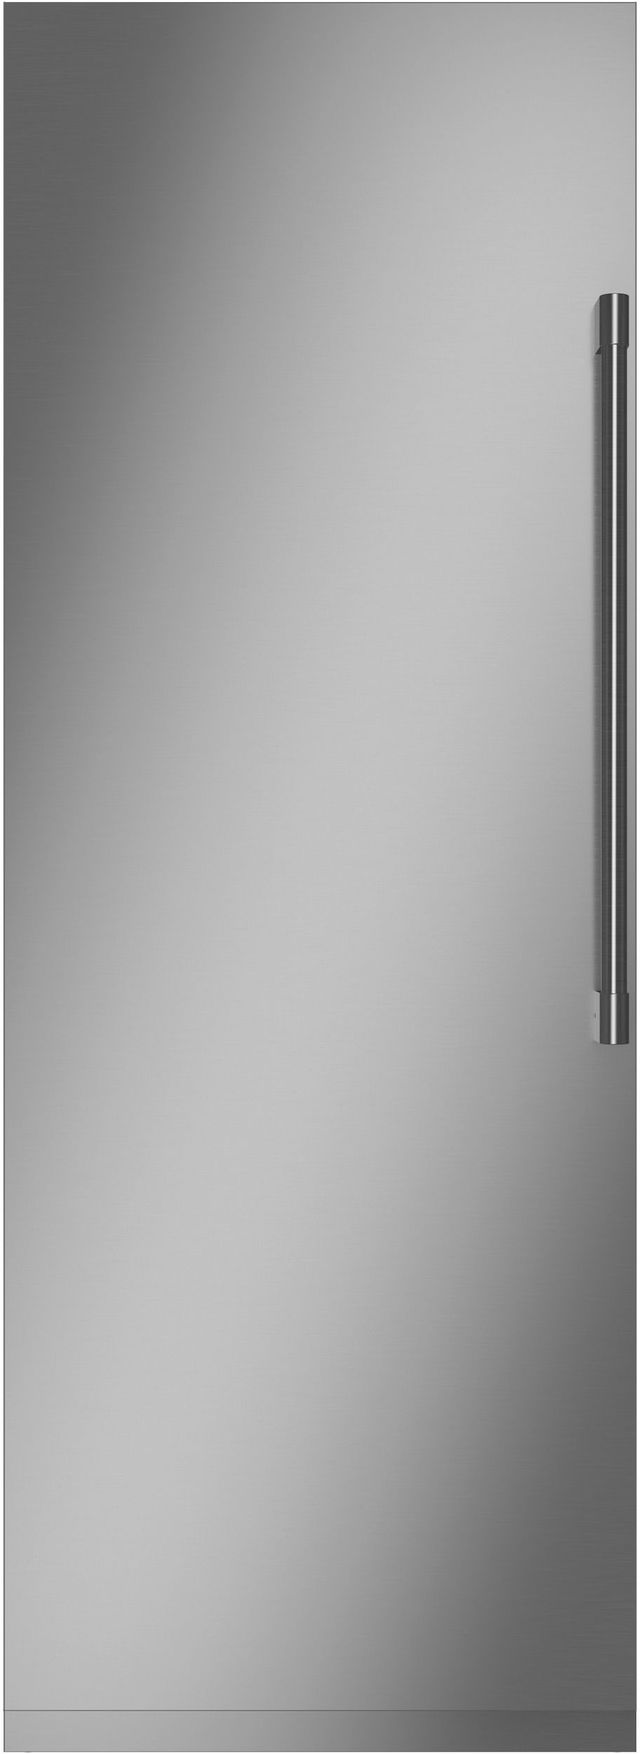 Monogram® 16.73 Cu. Ft. Custom Panel Smart Integrated Column Freezer-ZIF301NPNII